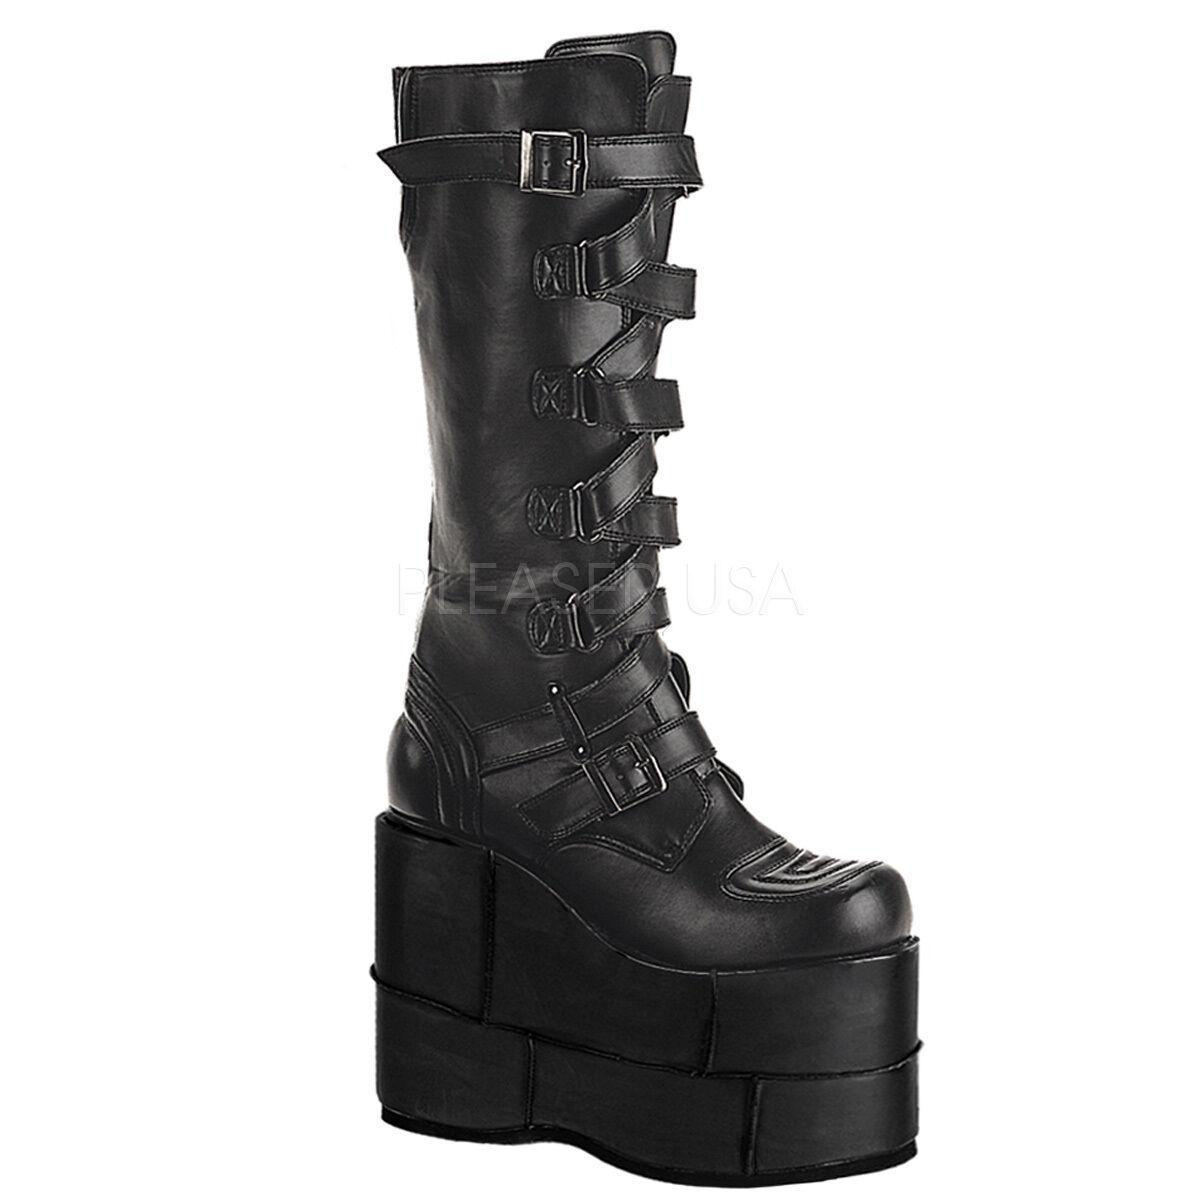 DEMONIA STA308/B/PU Men's Platform Industrial Goth Black Gogo Knee High Boots